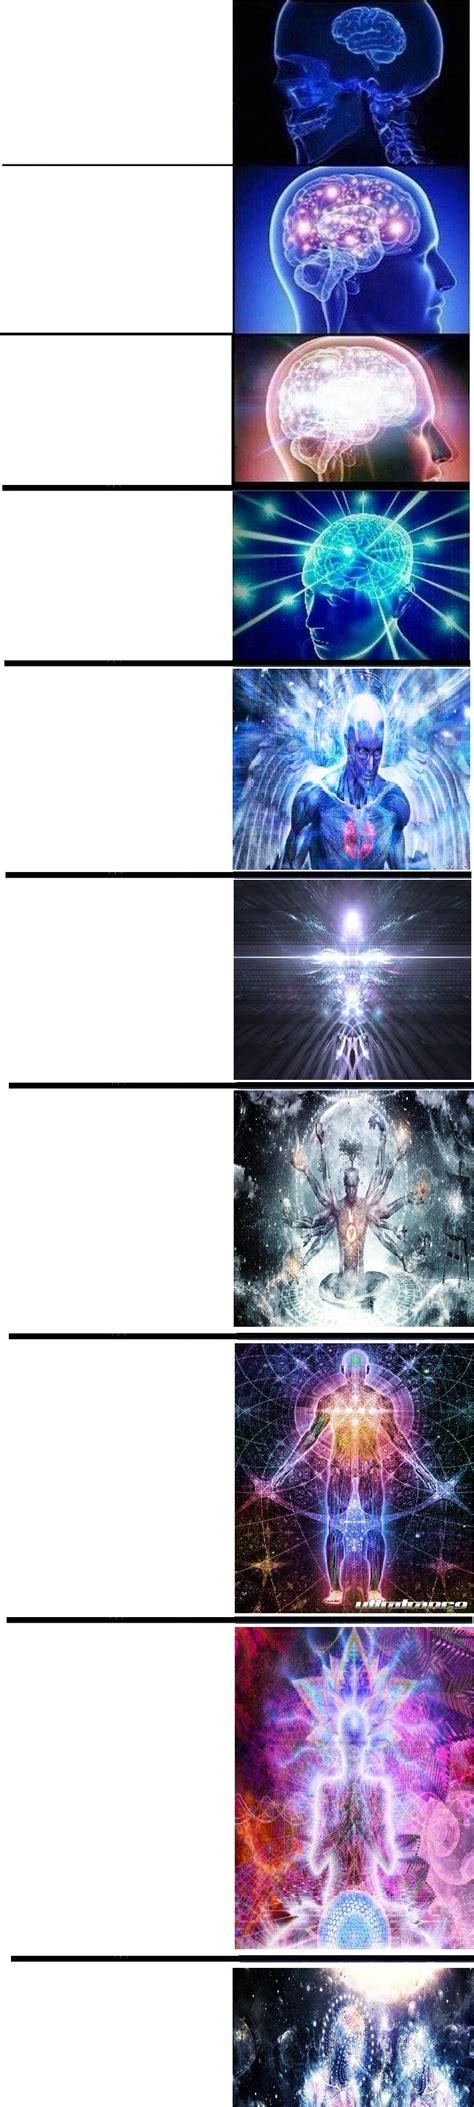 expanding brain meme template expanding brain template expanding brain your meme